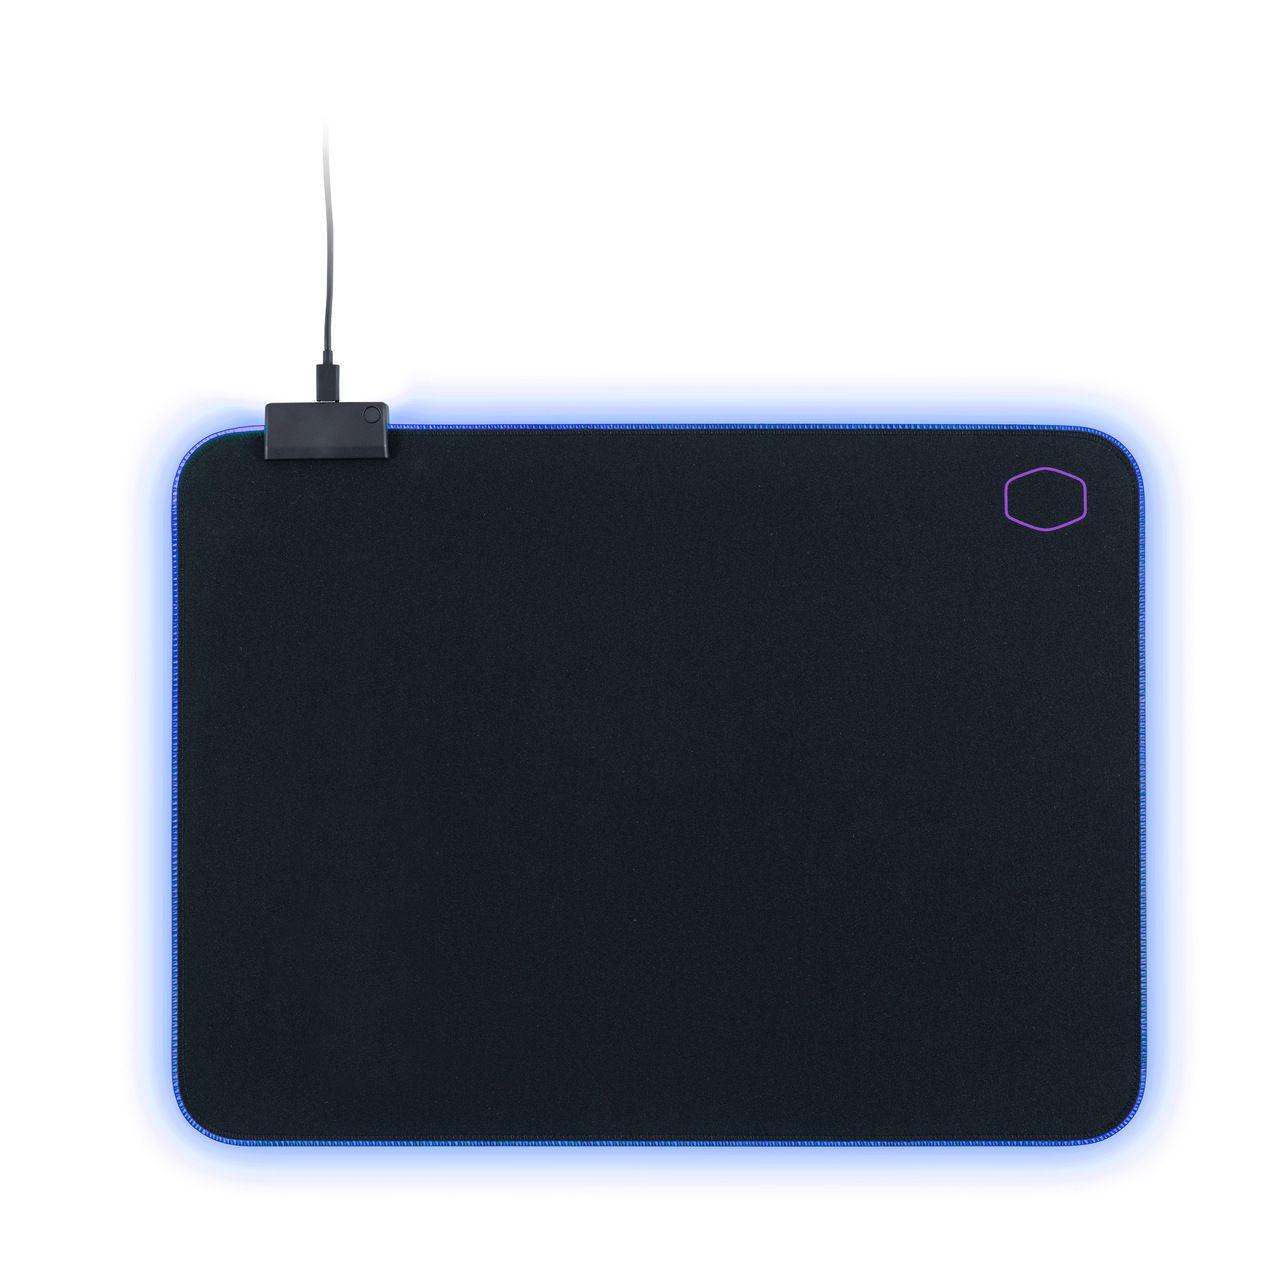 Mousepad Gamer Rgb Grande 47x35cm Cooler Master Mp750-L Speed FPS